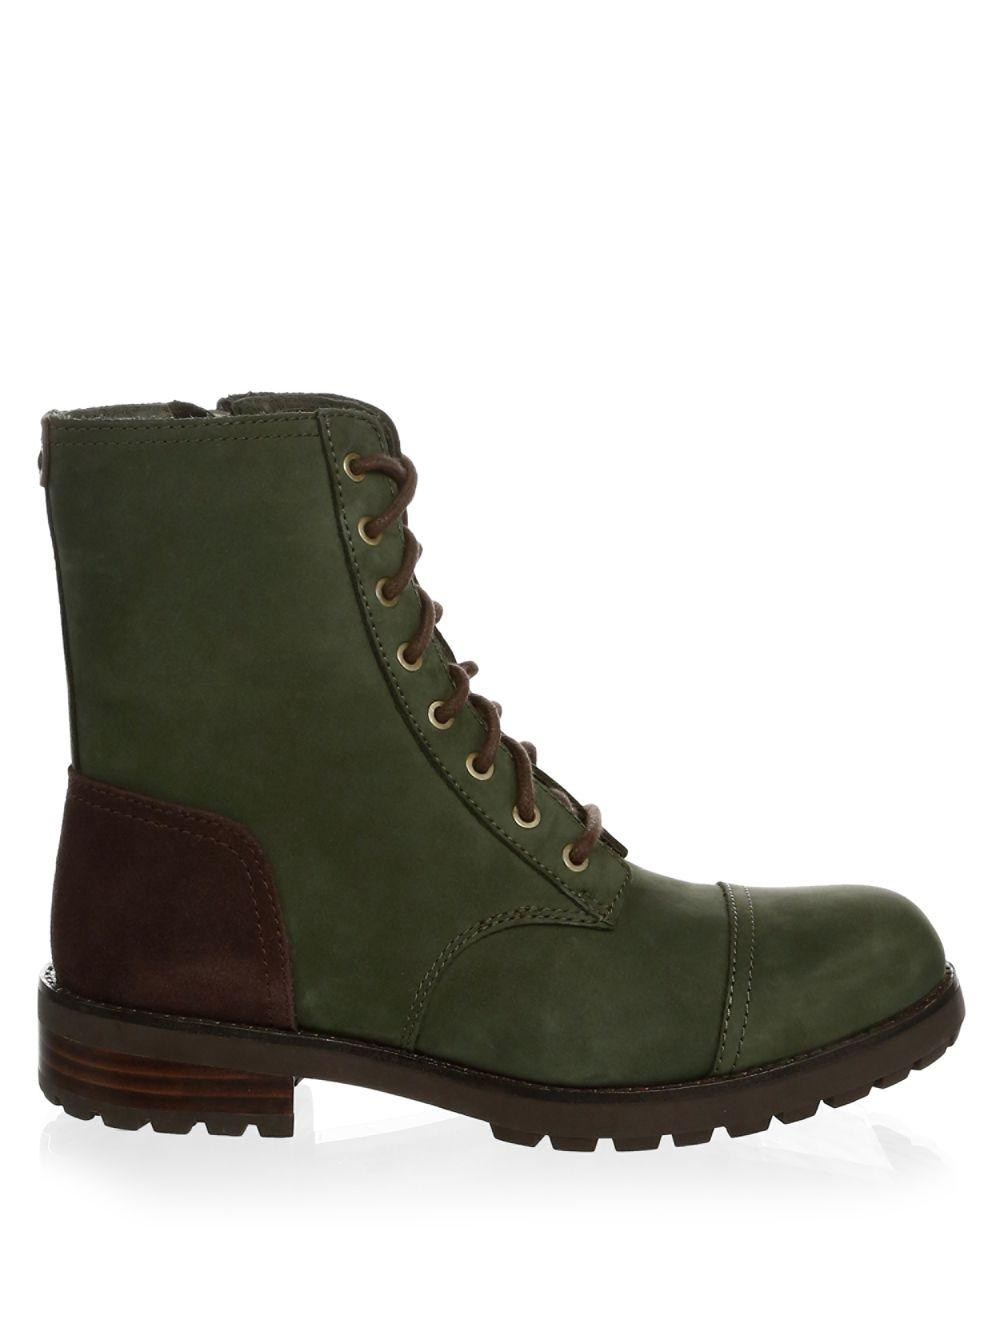 fc3d1cba582 Women's Green Kilmer Shearling-trim Leather Booties